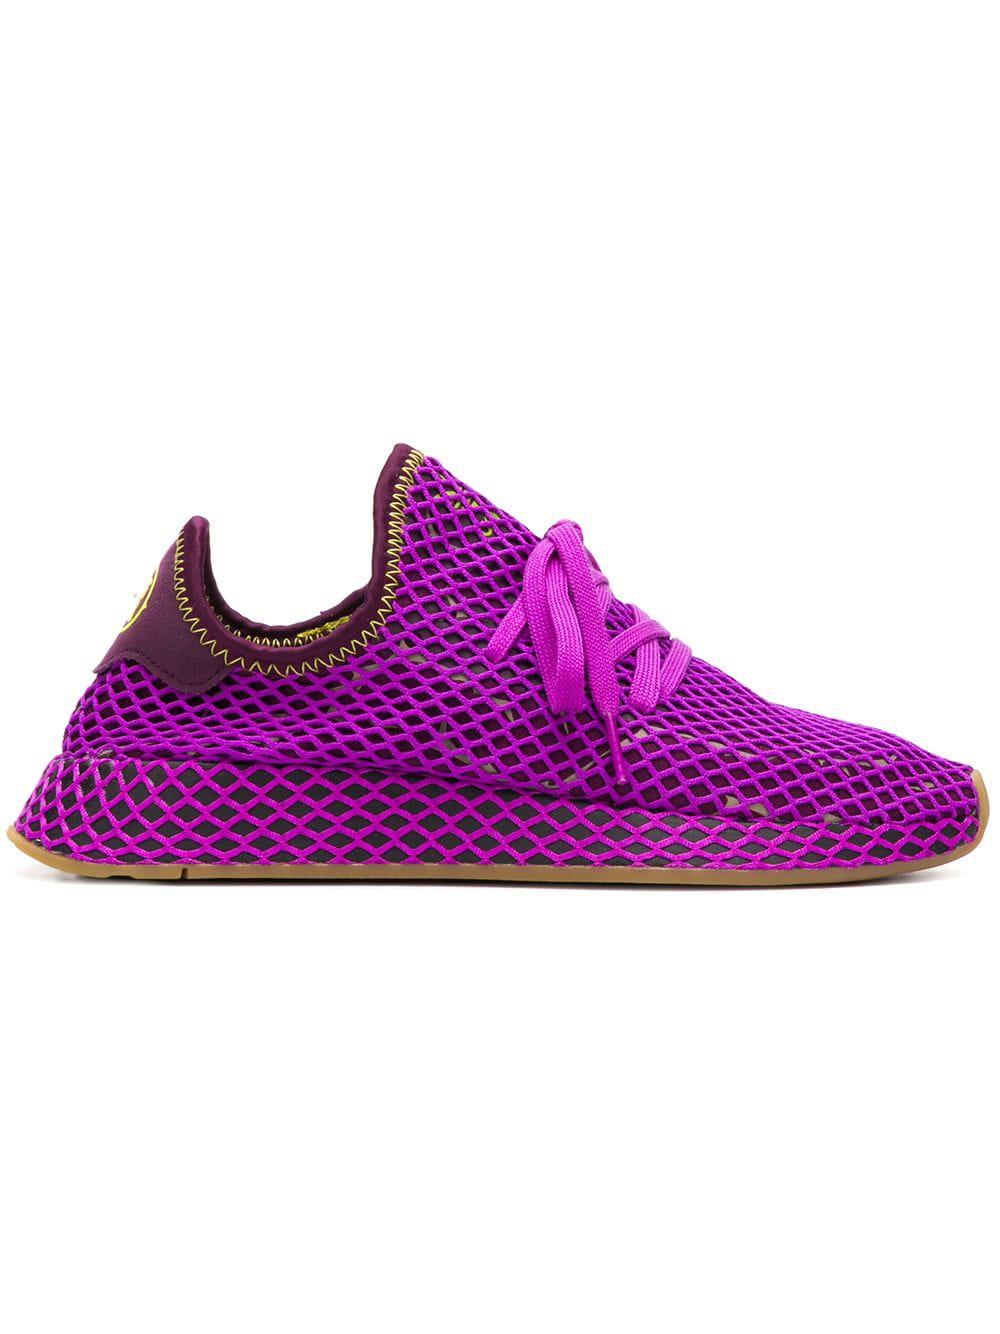 Adidas Dragon Ball Z Deerupt Sneakers - Purple